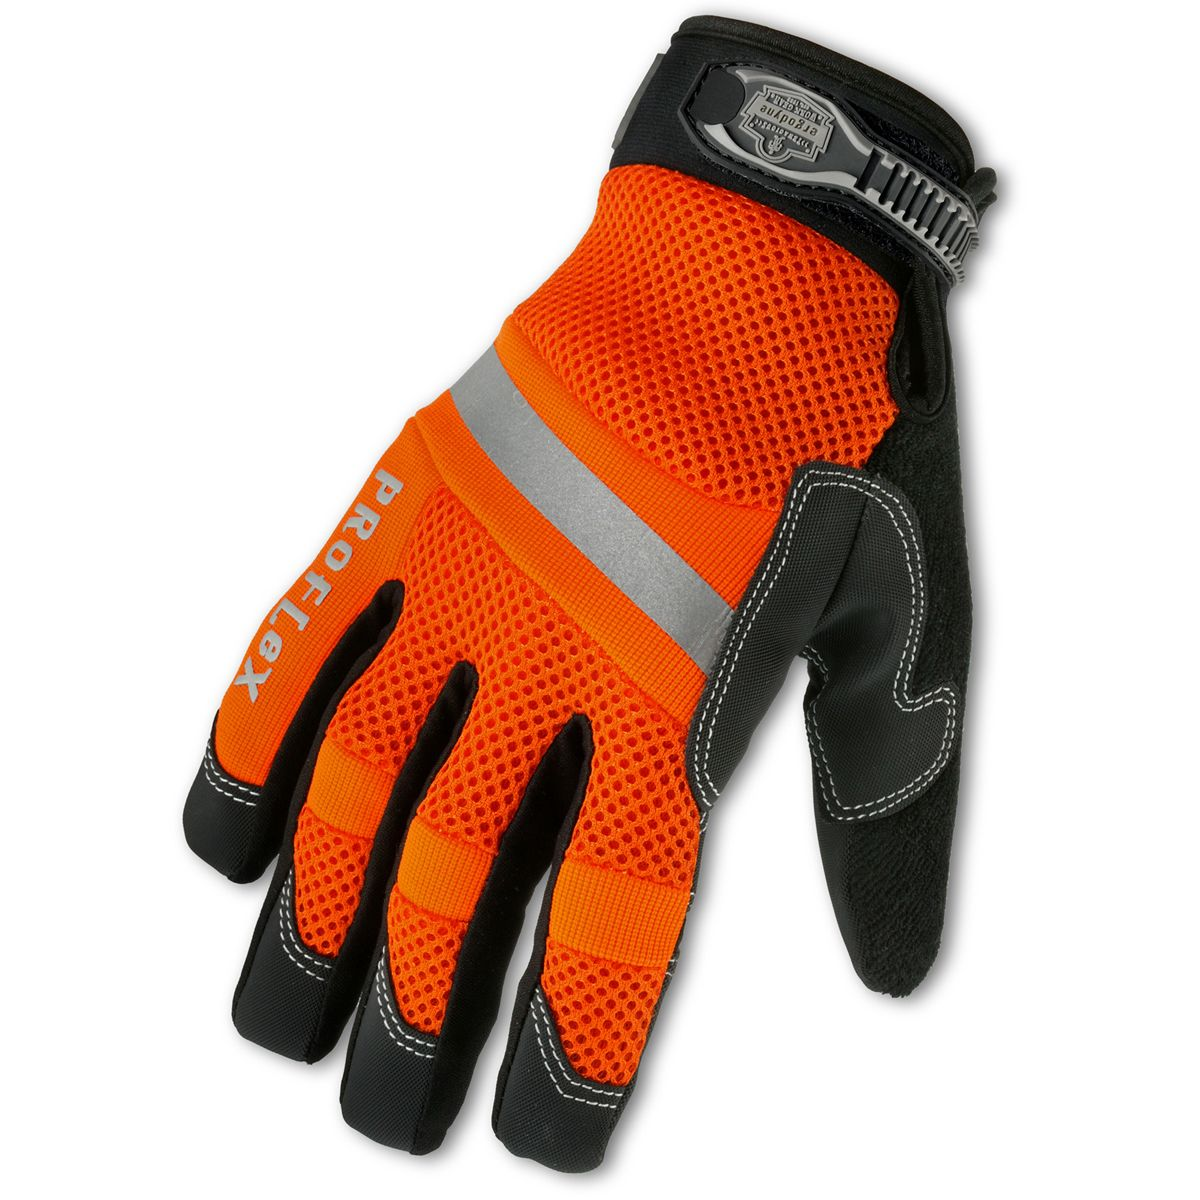 Ergodyne Proflex 876wp Hi Vis Thermal Waterproof Gloves Fullsource Com With Images Waterproof Gloves Work Gloves Gloves